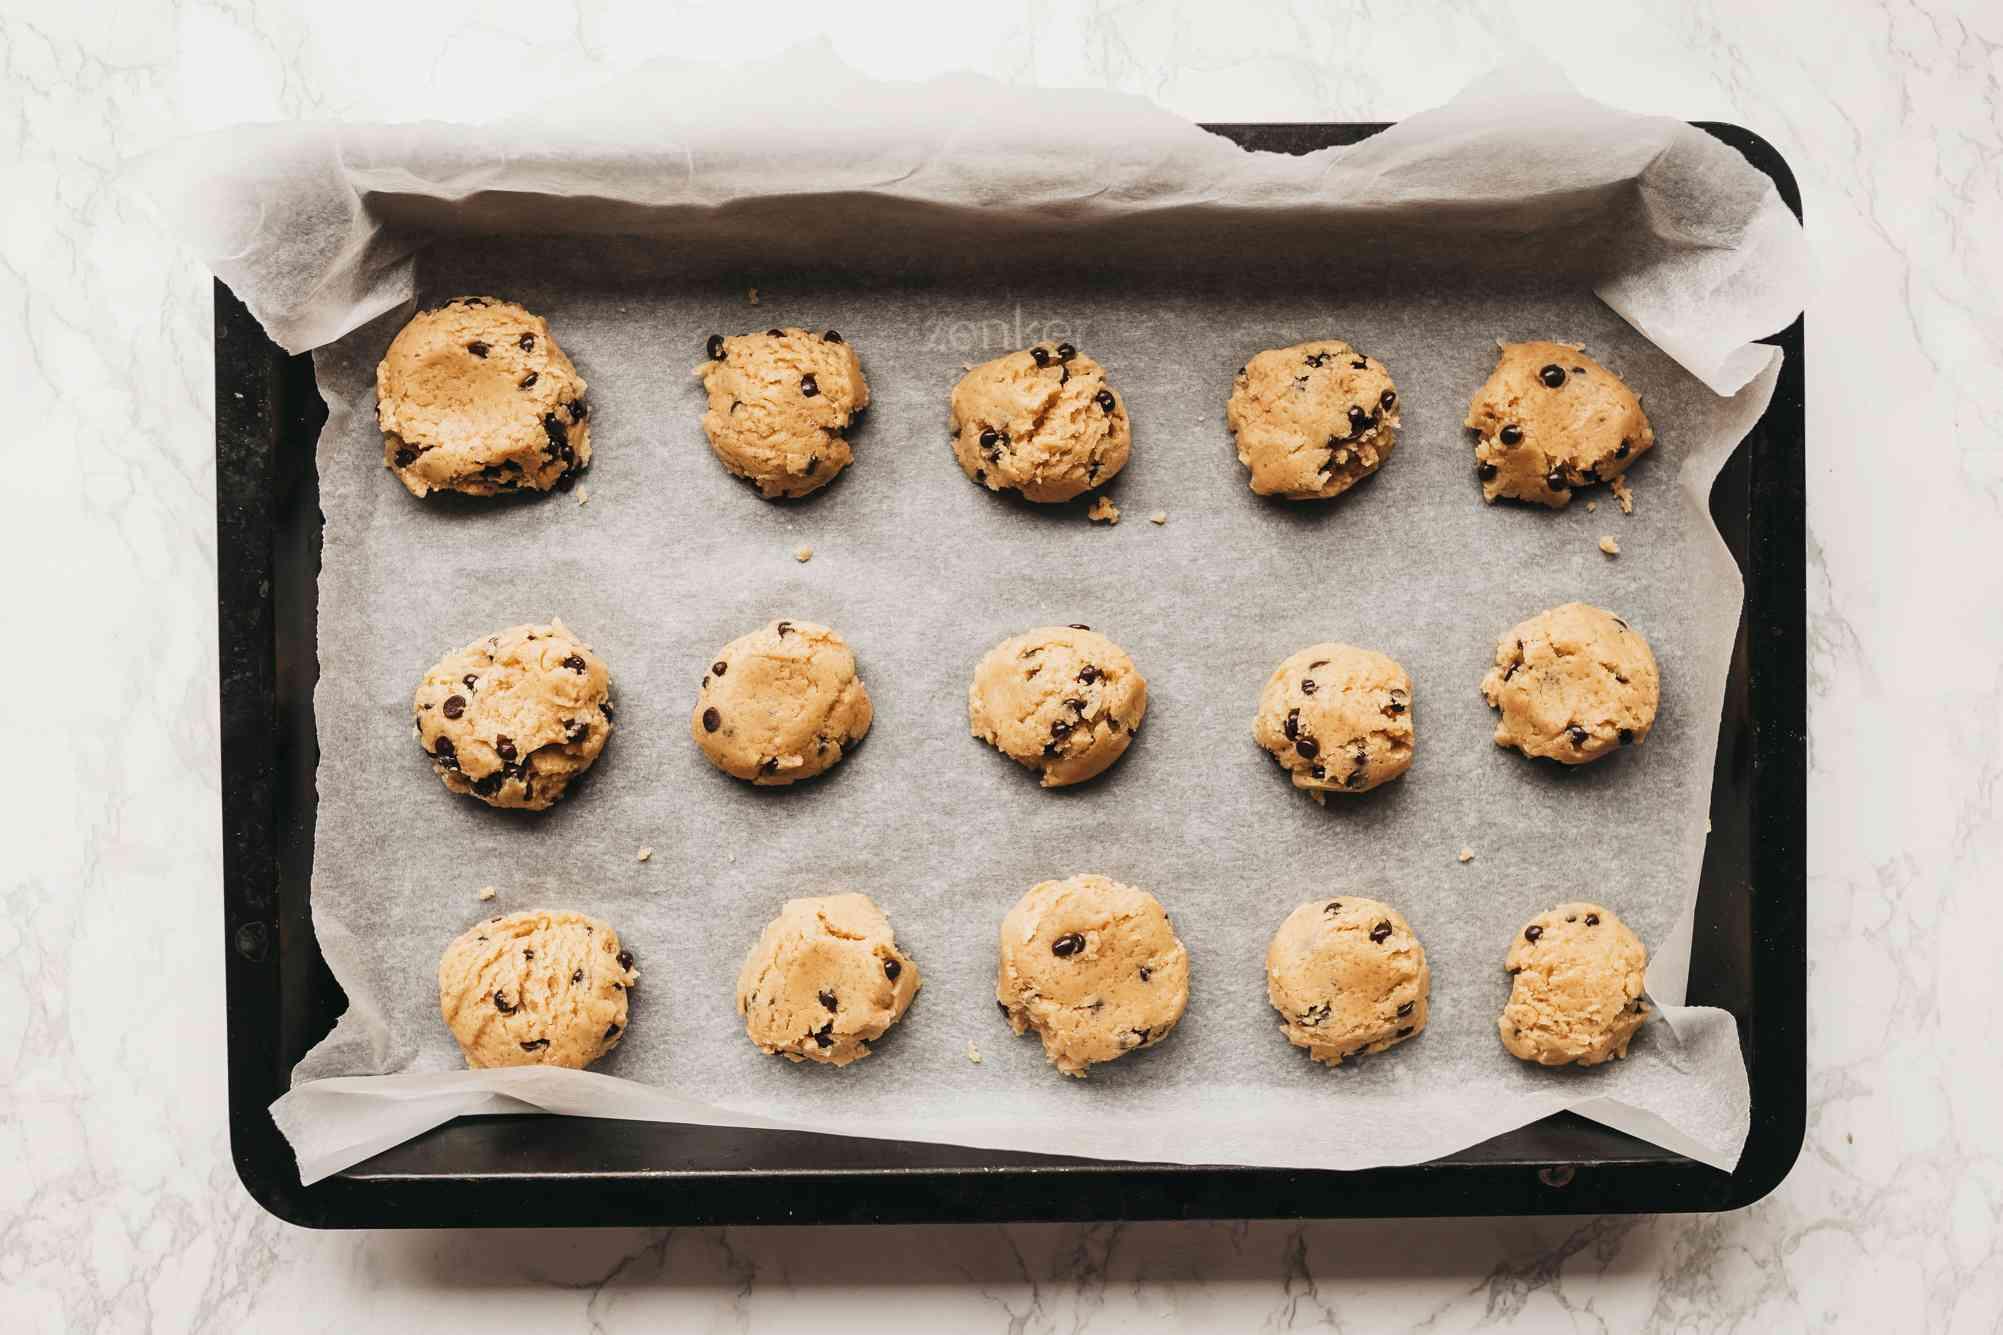 Drop spoonfuls onto baking sheet